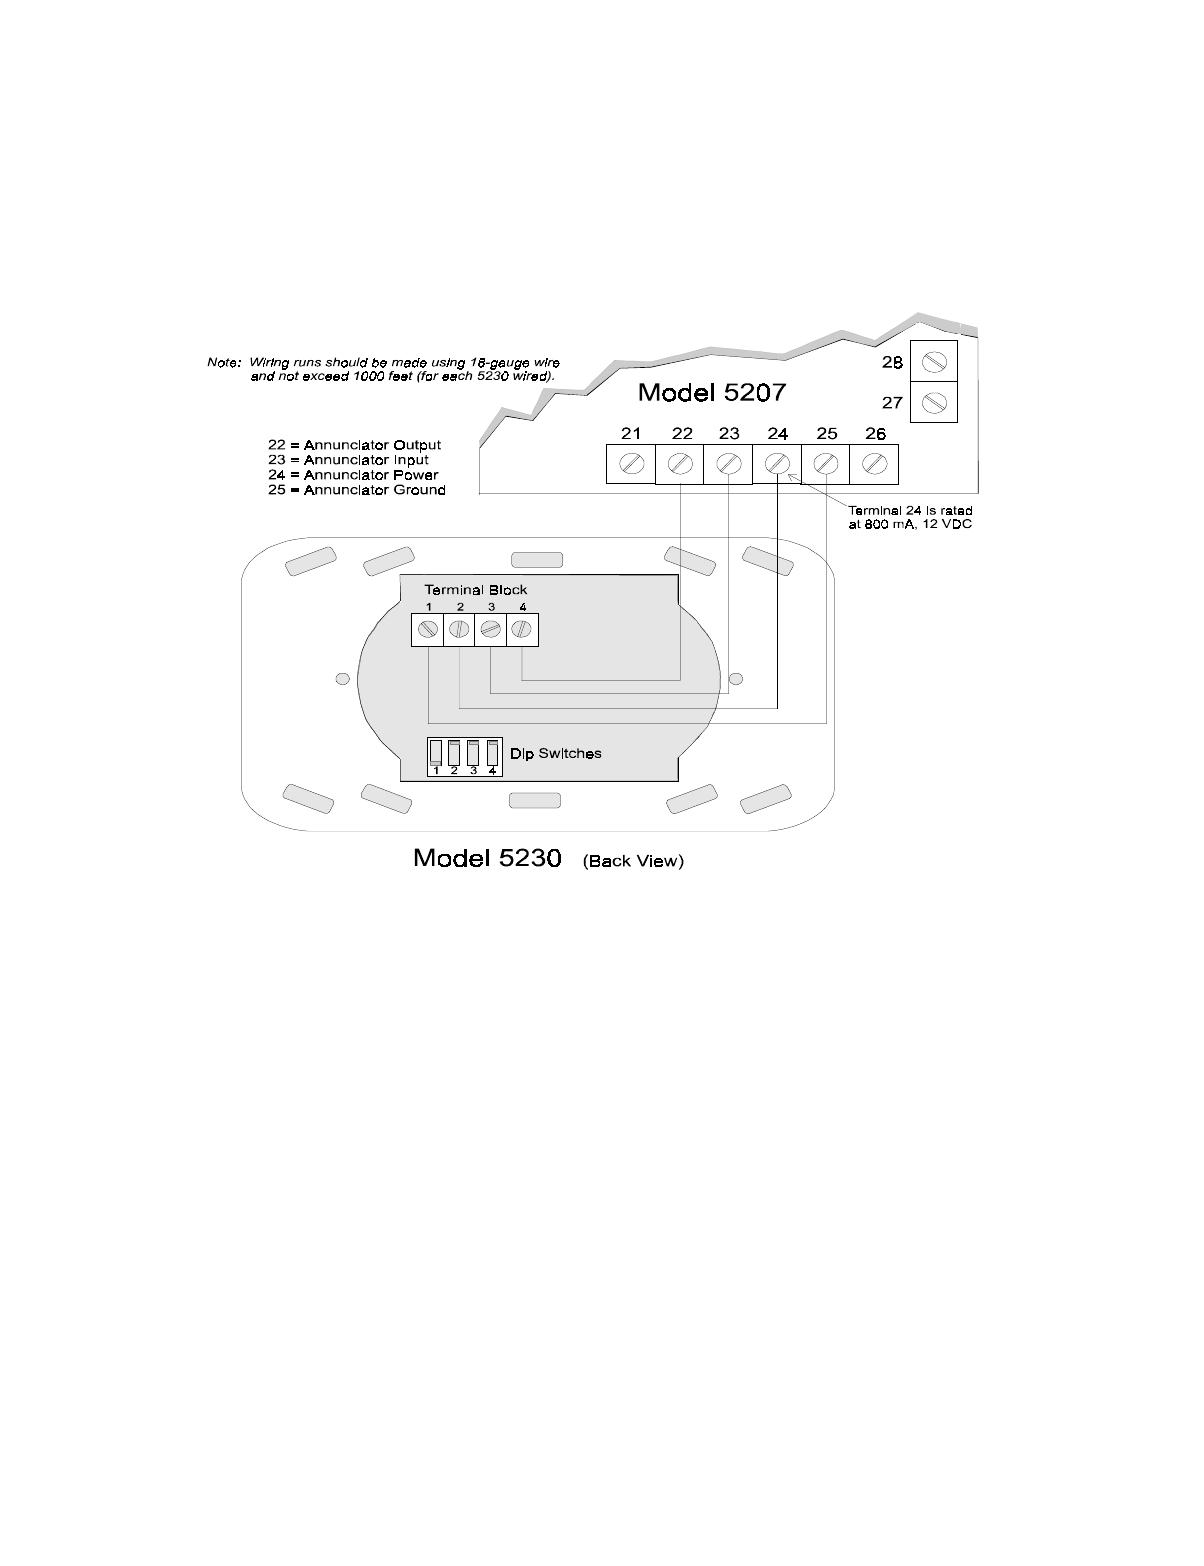 5207 Installation Manual on